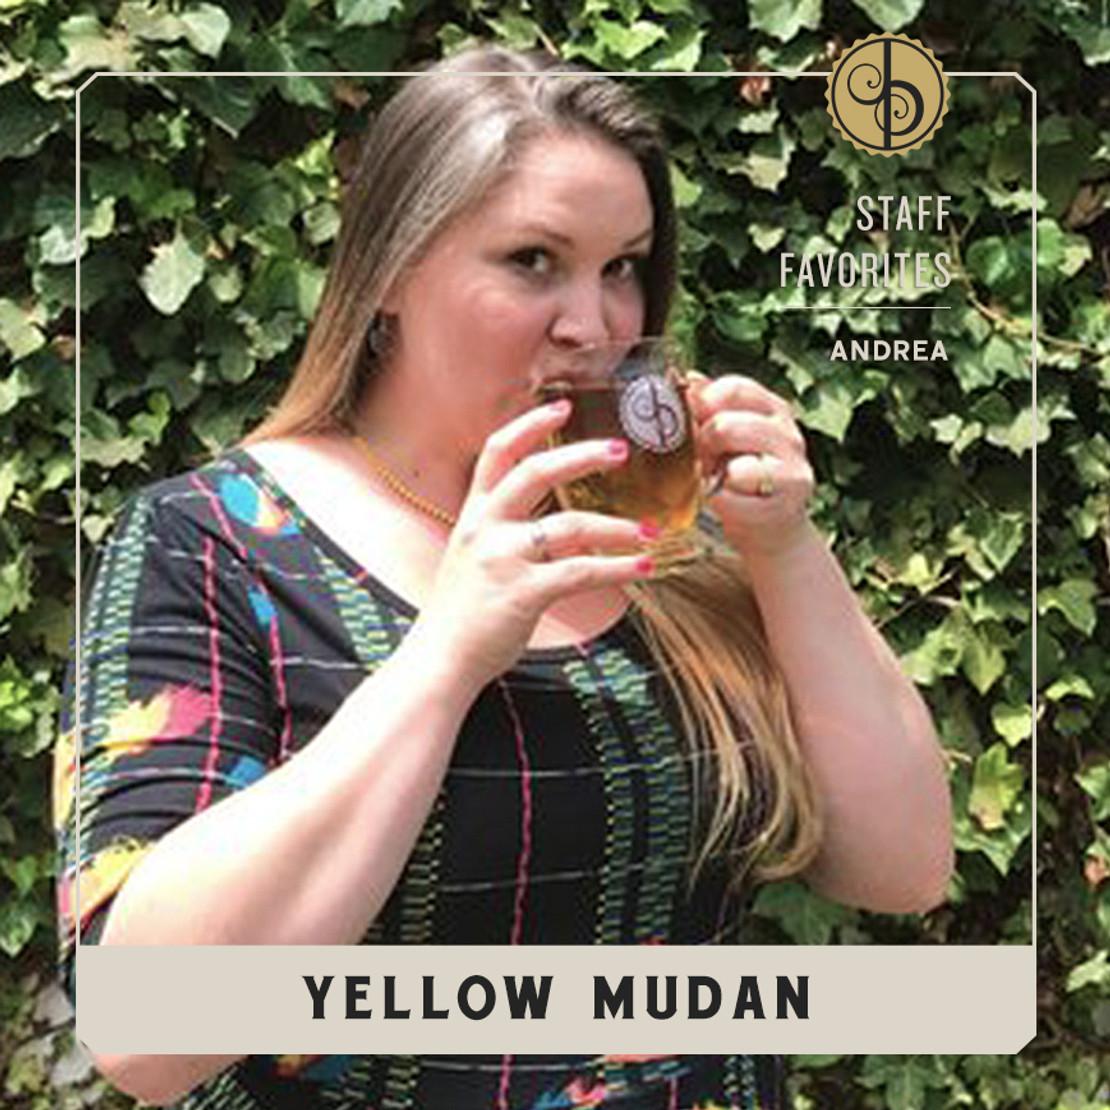 Staff Favorites: Andrea & Yellow Mudan